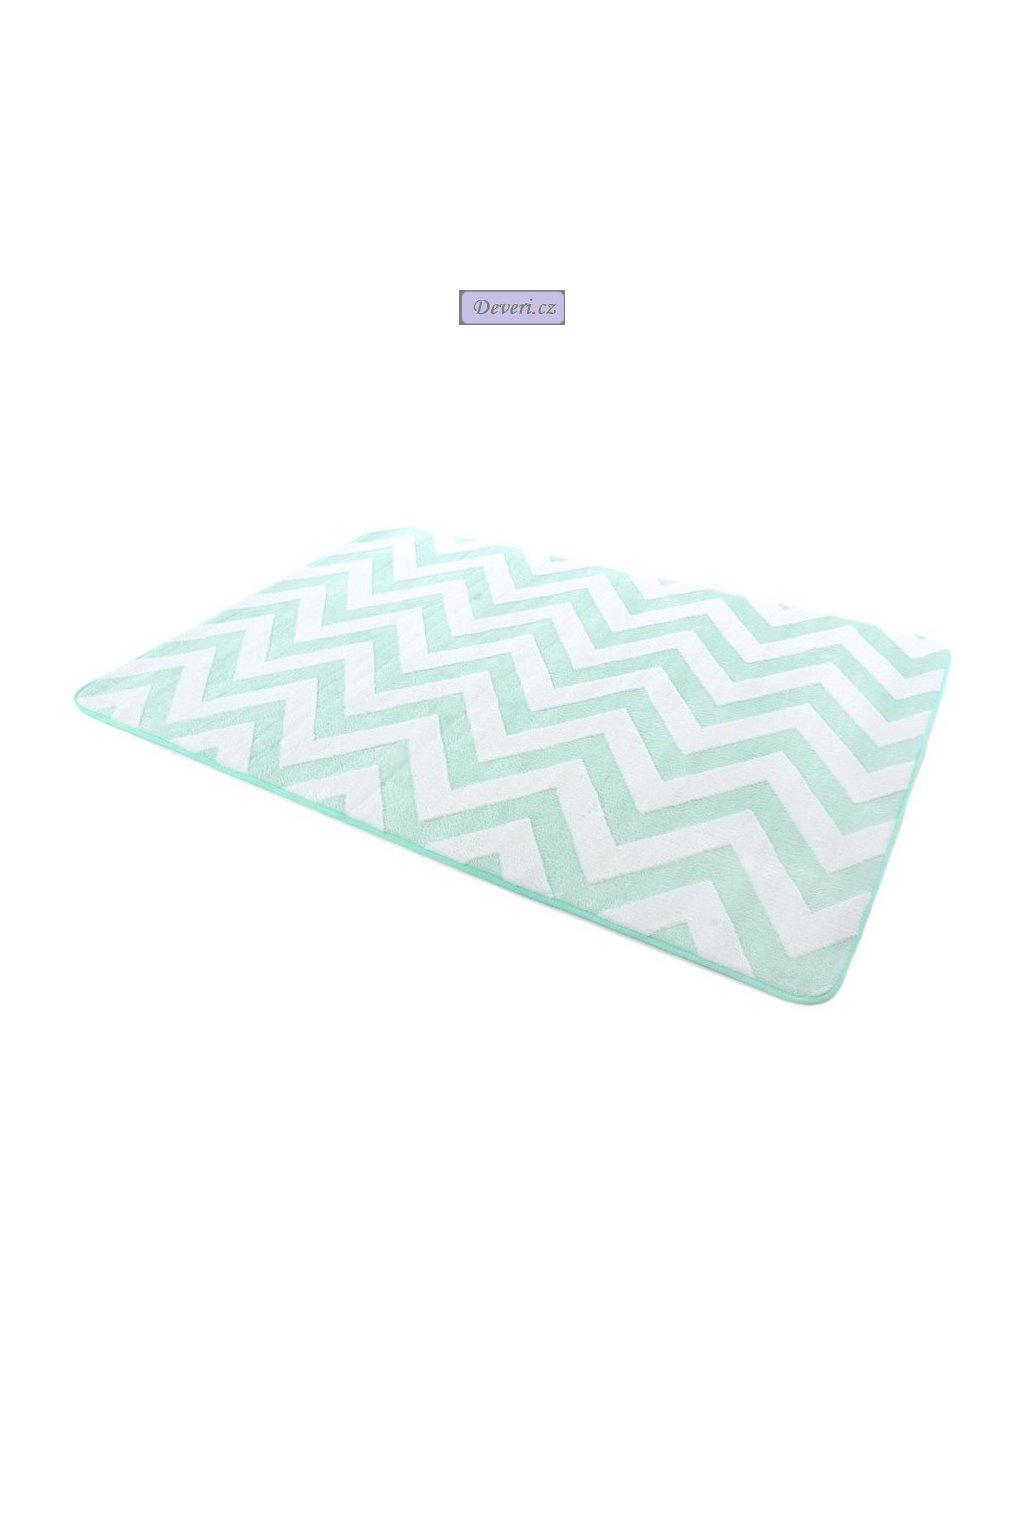 Plyšový kusový koberec 3D zig zag mátovo bílý